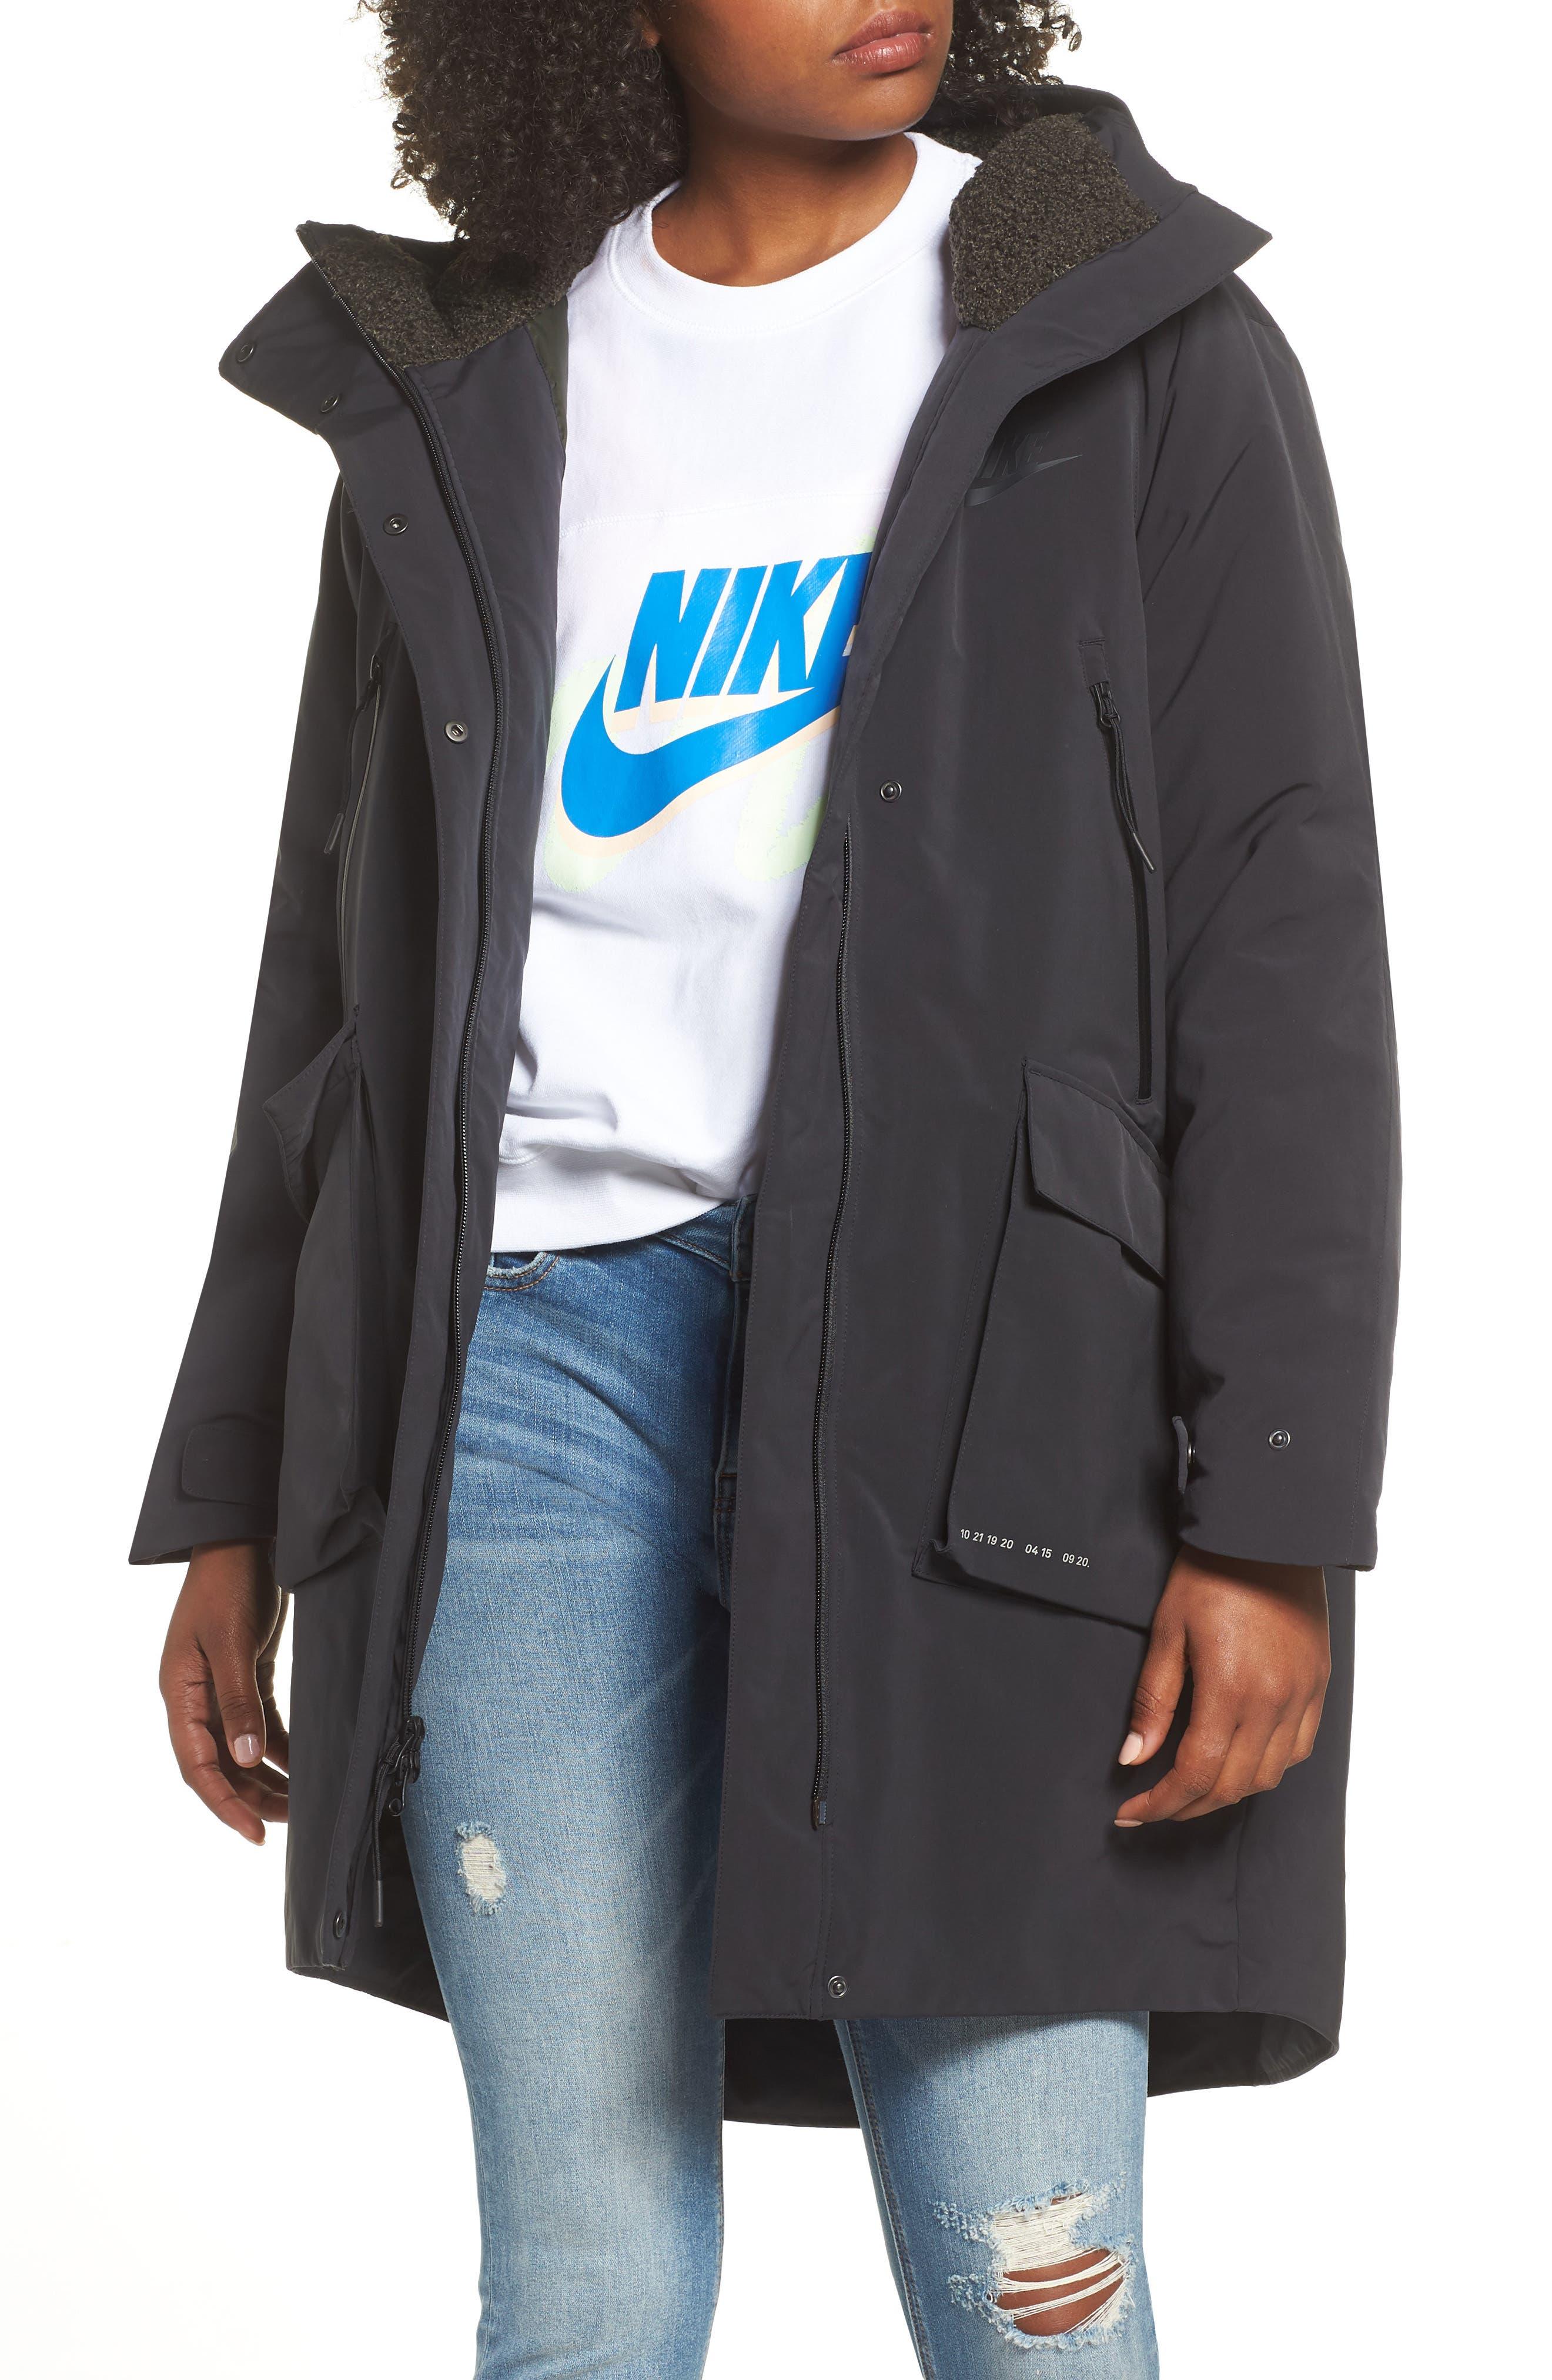 Sportswear Tech Pack Women's Down Fill Parka,                             Main thumbnail 1, color,                             BLACK/ NEWSPRINT/ BLACK